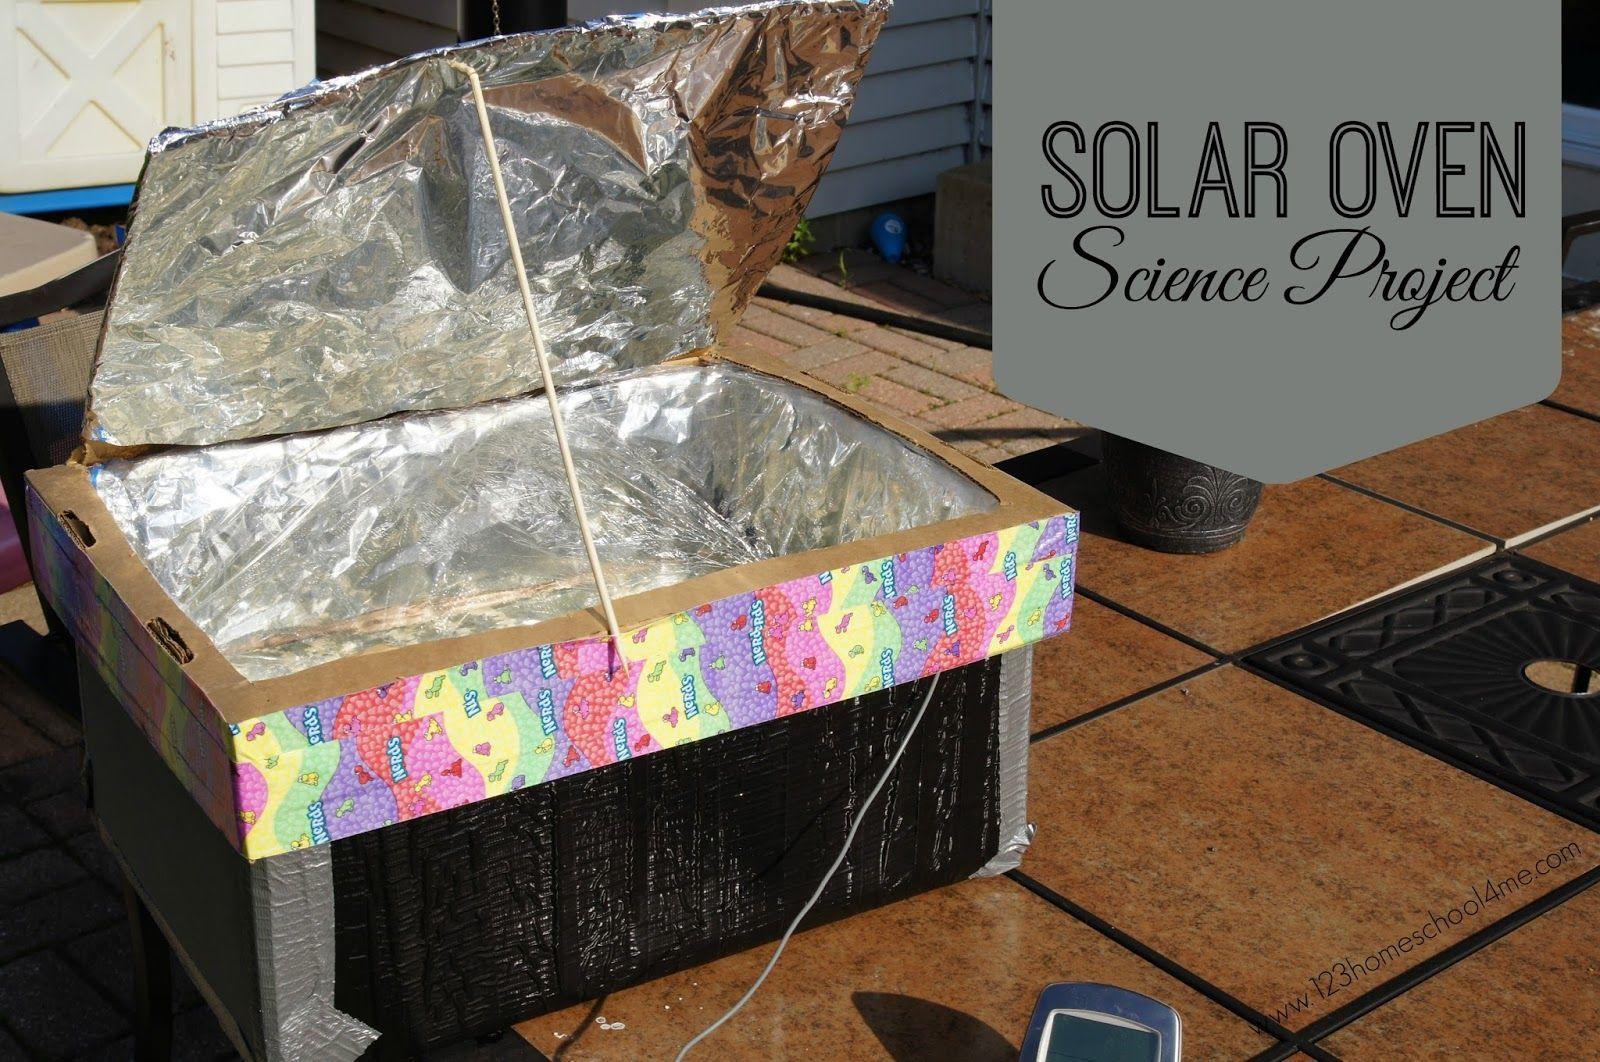 Workbooks solar energy worksheets for kids : Solar+Oven+Science+Project+for+Kids.jpg (1600×1062) | universo ...